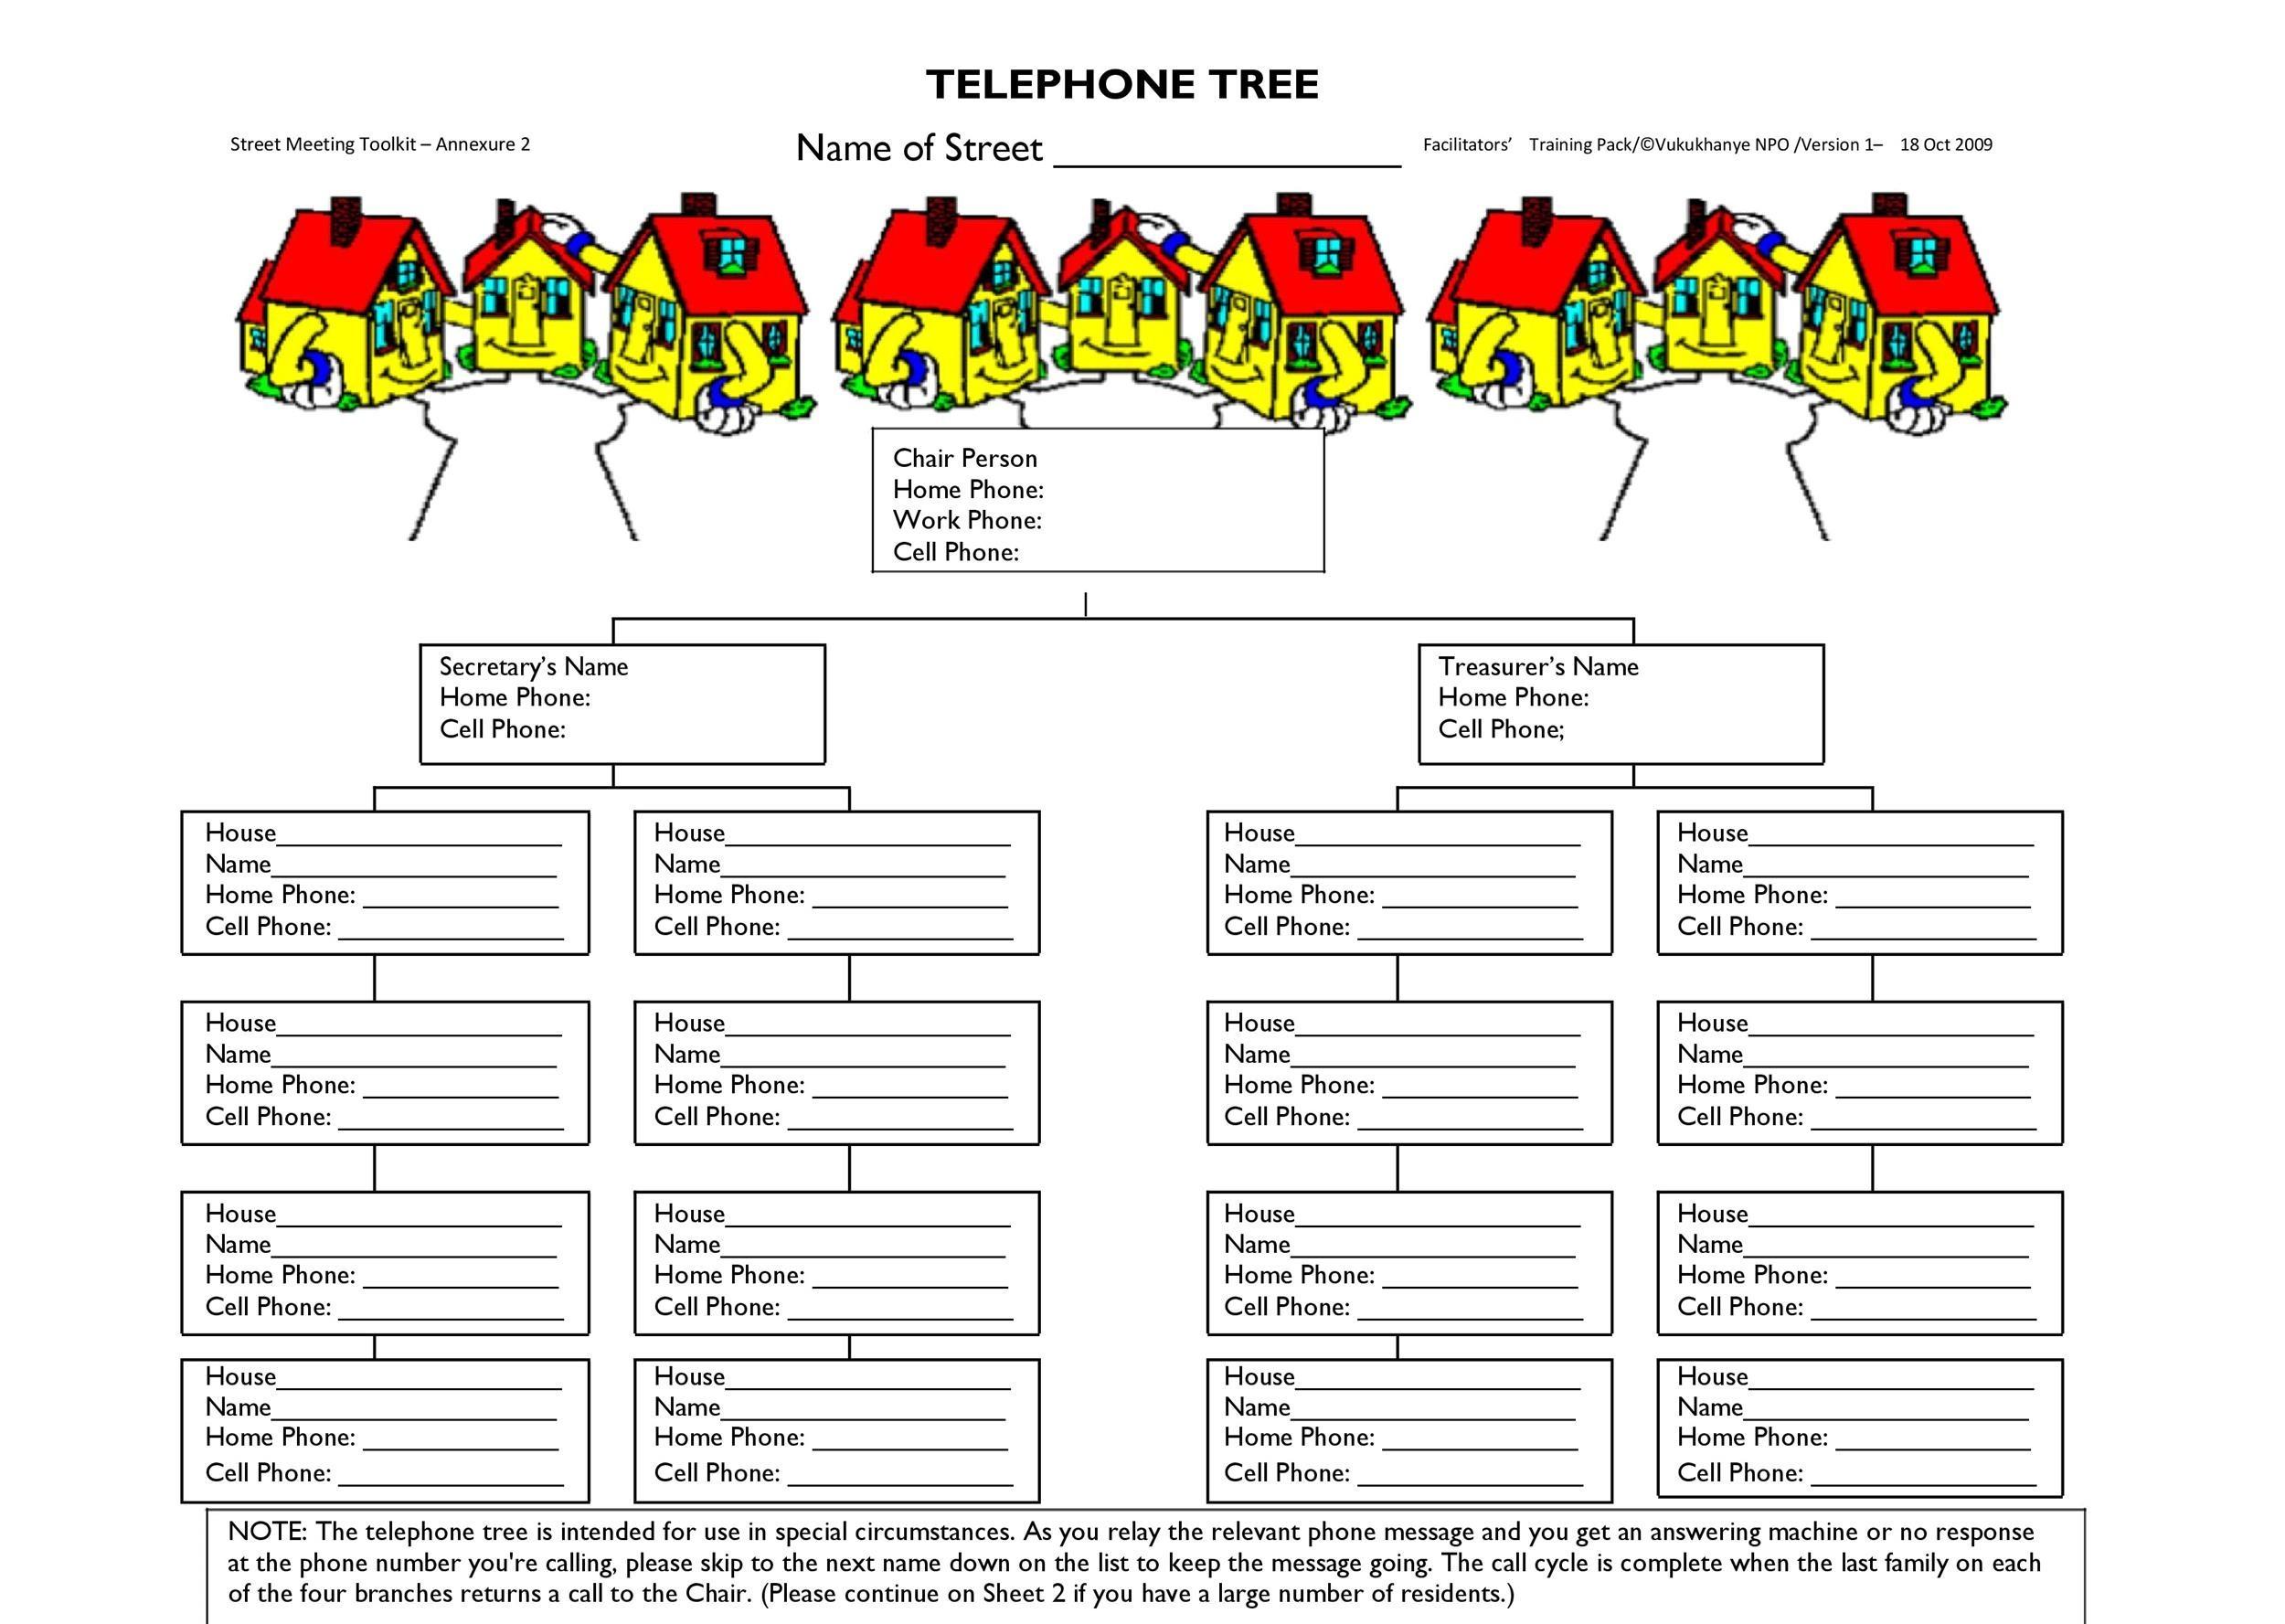 Free phone tree template 37